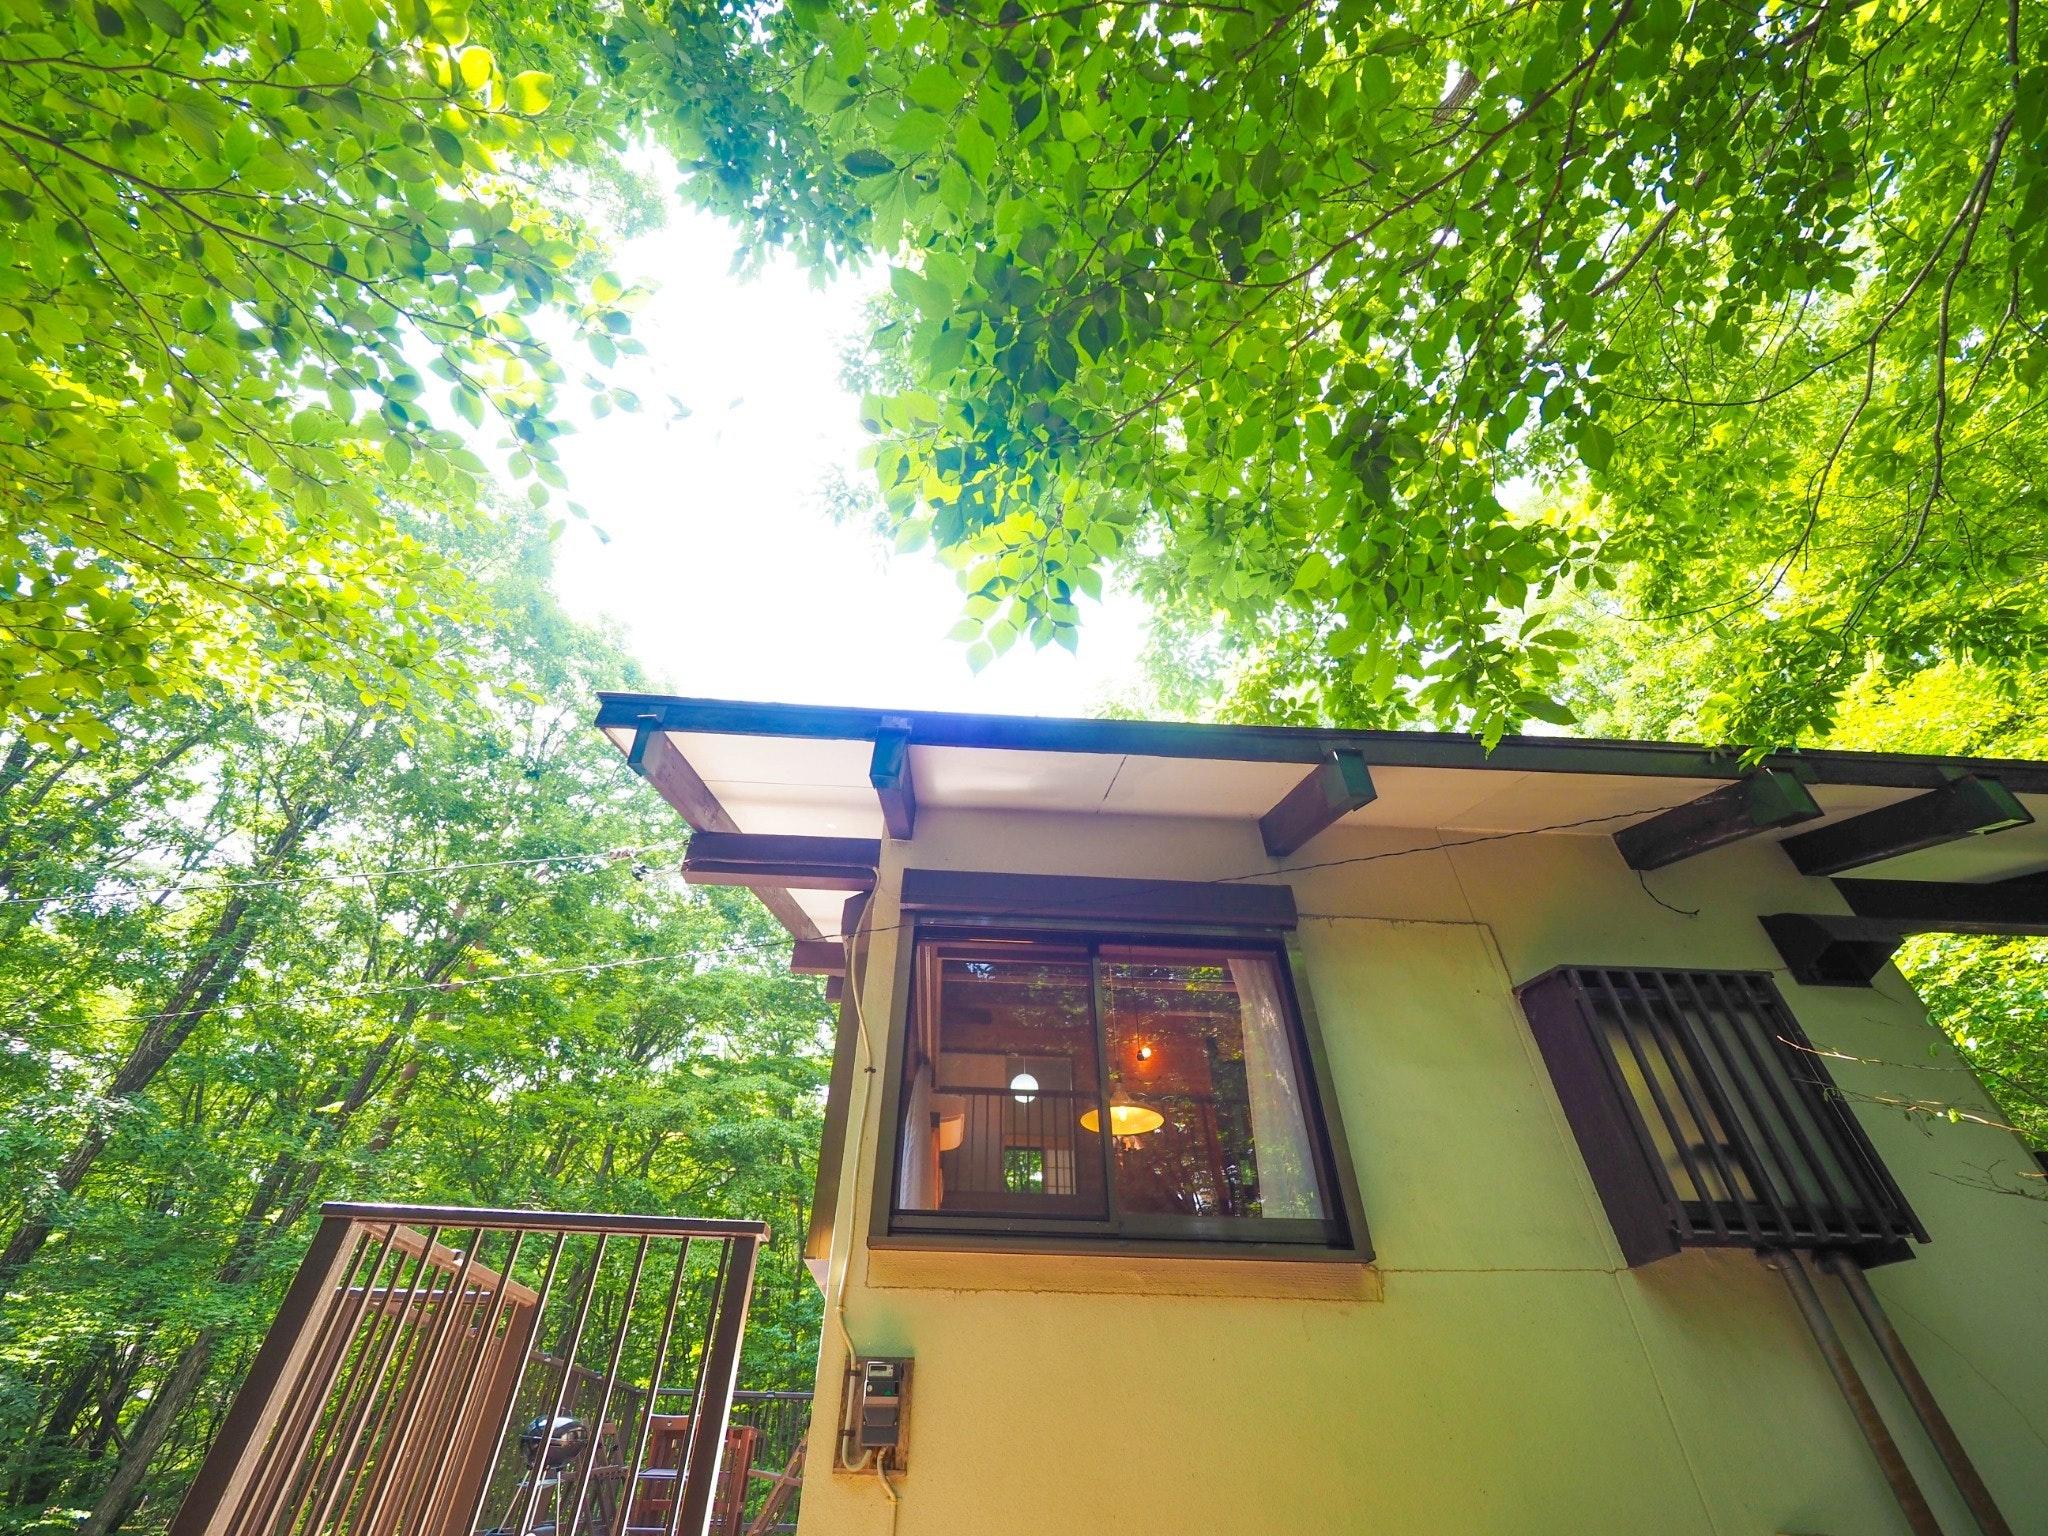 Kamiina Life: 緑が目に染む森に囲まれたコテージ、家族のだんらん、那須の休日